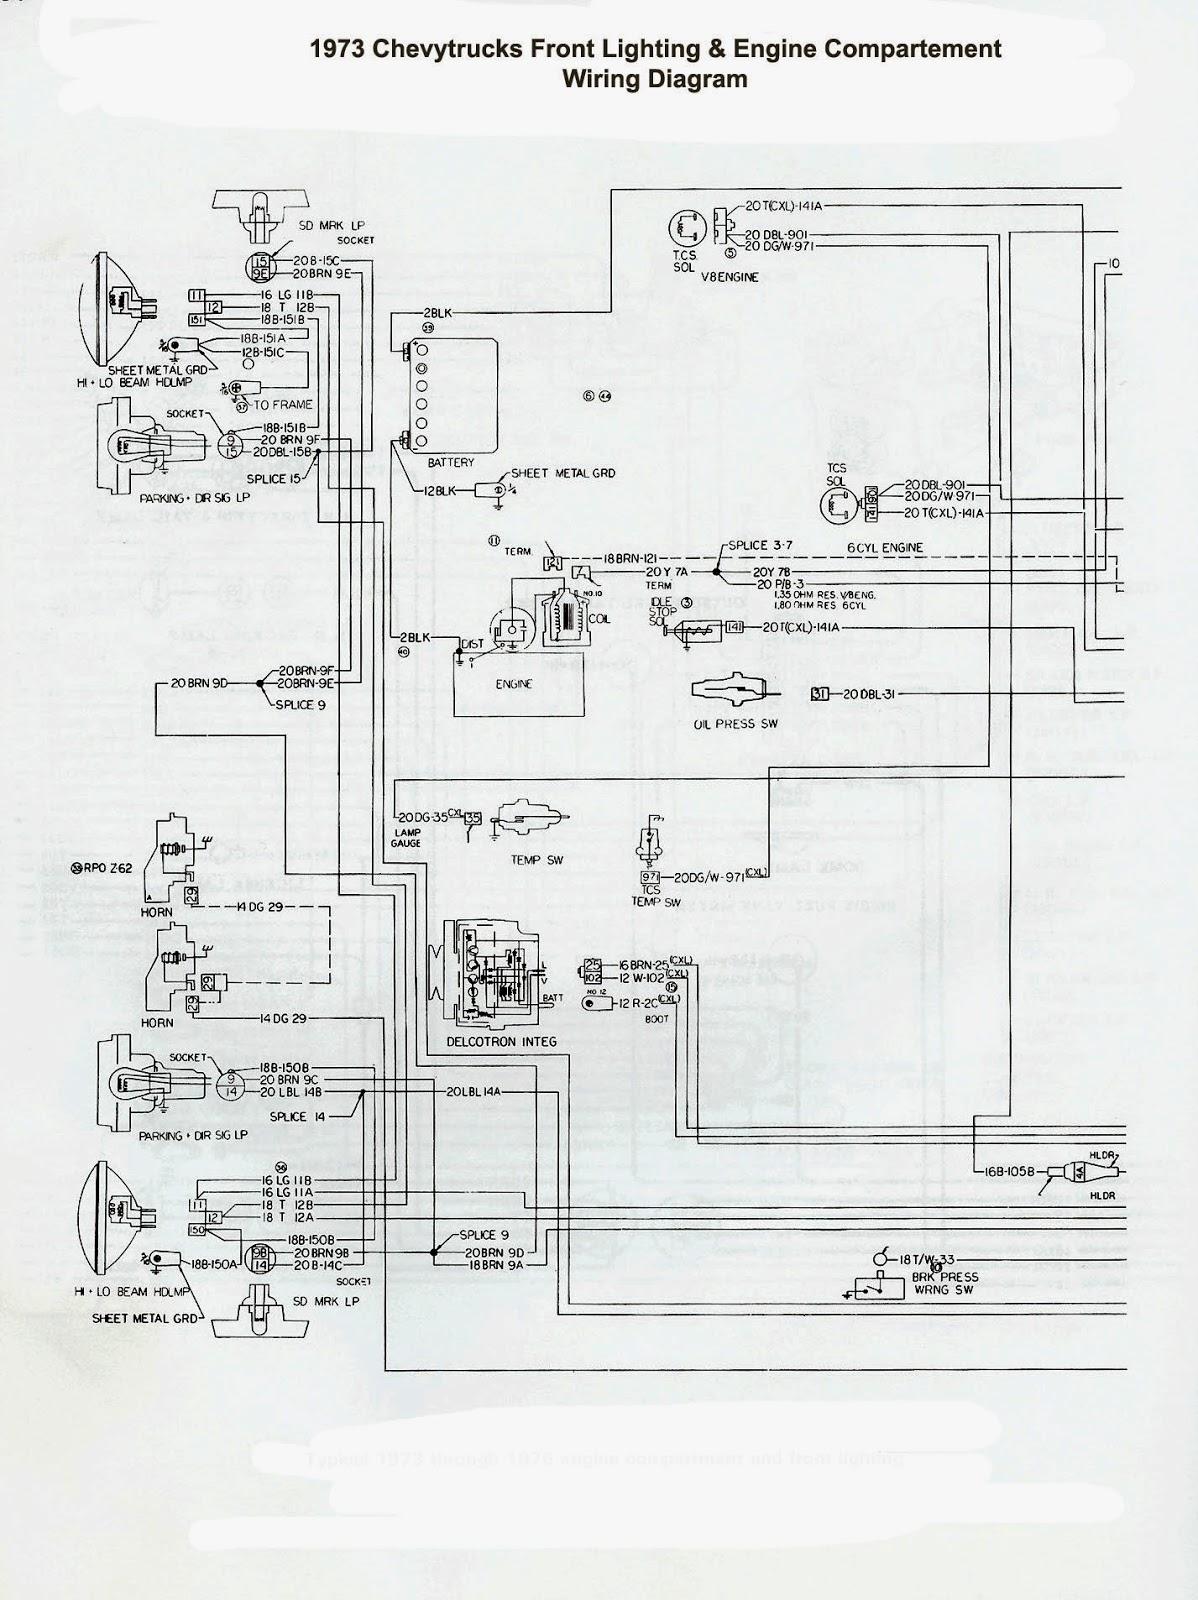 1978 camaro wiring diagram heater core